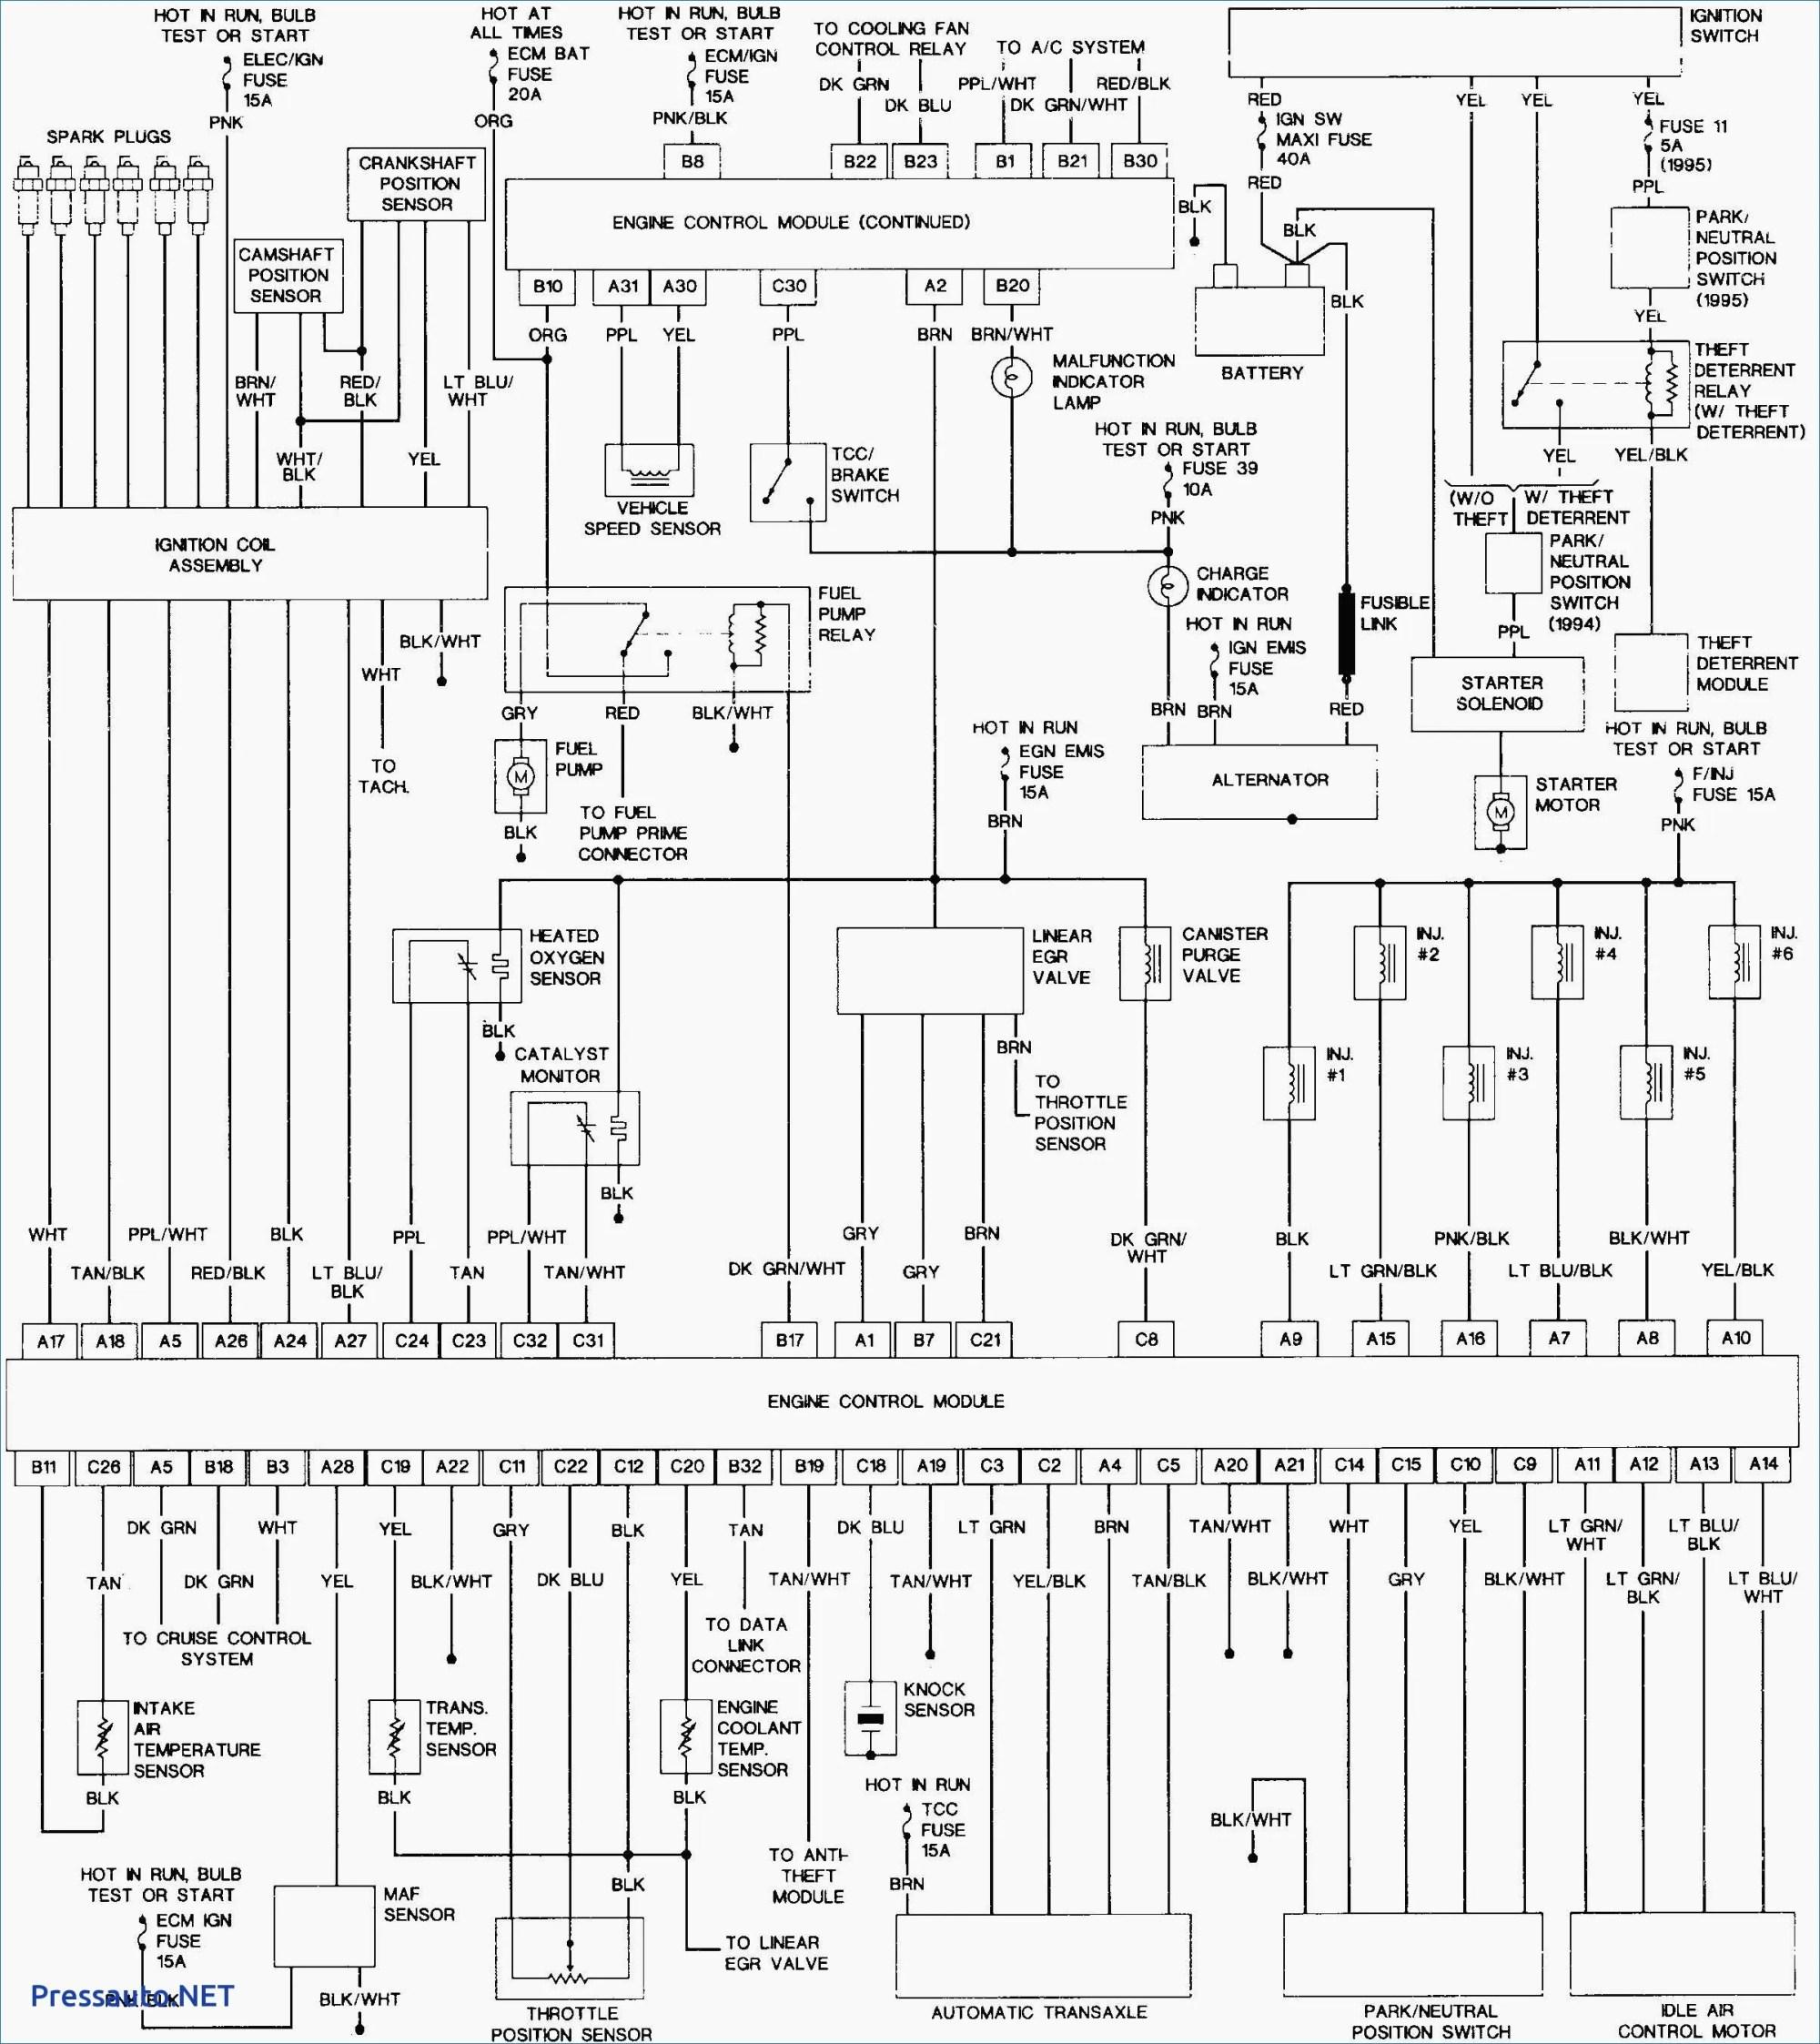 hight resolution of 2001 jetta engine diagram online manuual of wiring diagram 2001 volkswagen jetta engine diagram 2001 jetta engine diagram